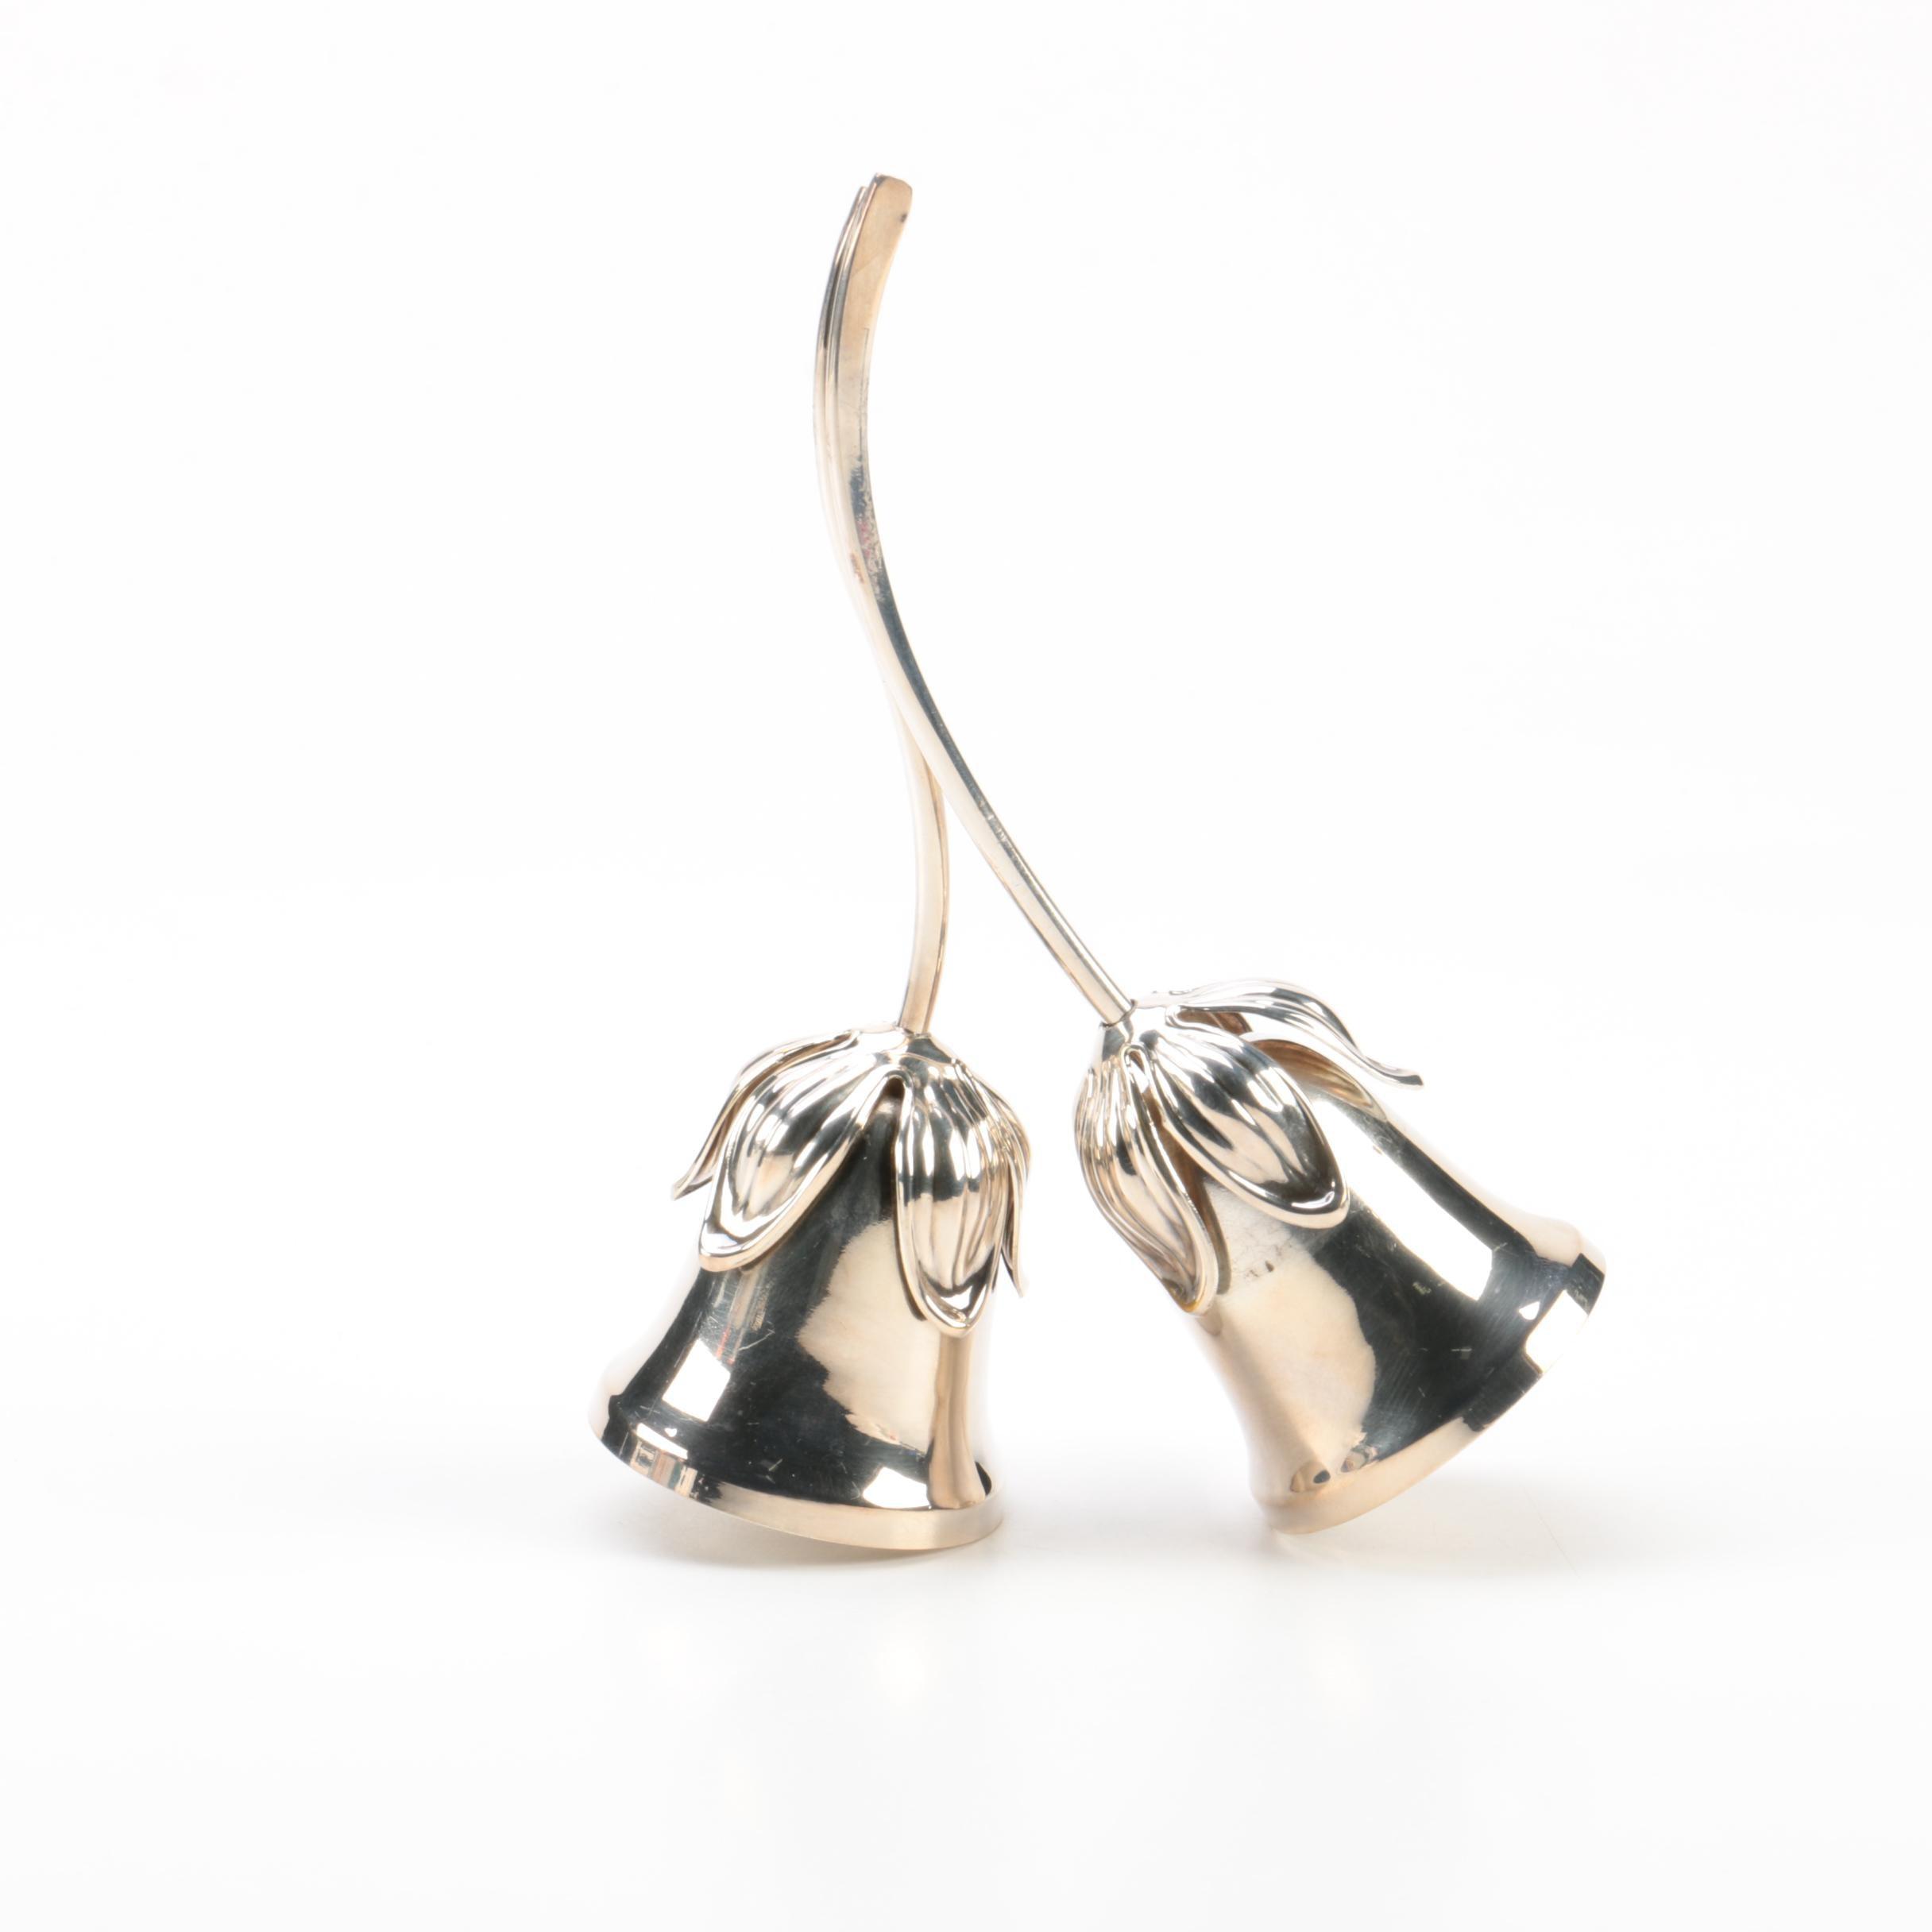 Hans Jensen/Eisenberg-Lozano Inc. Imported Danish Silver Plate Double Bell